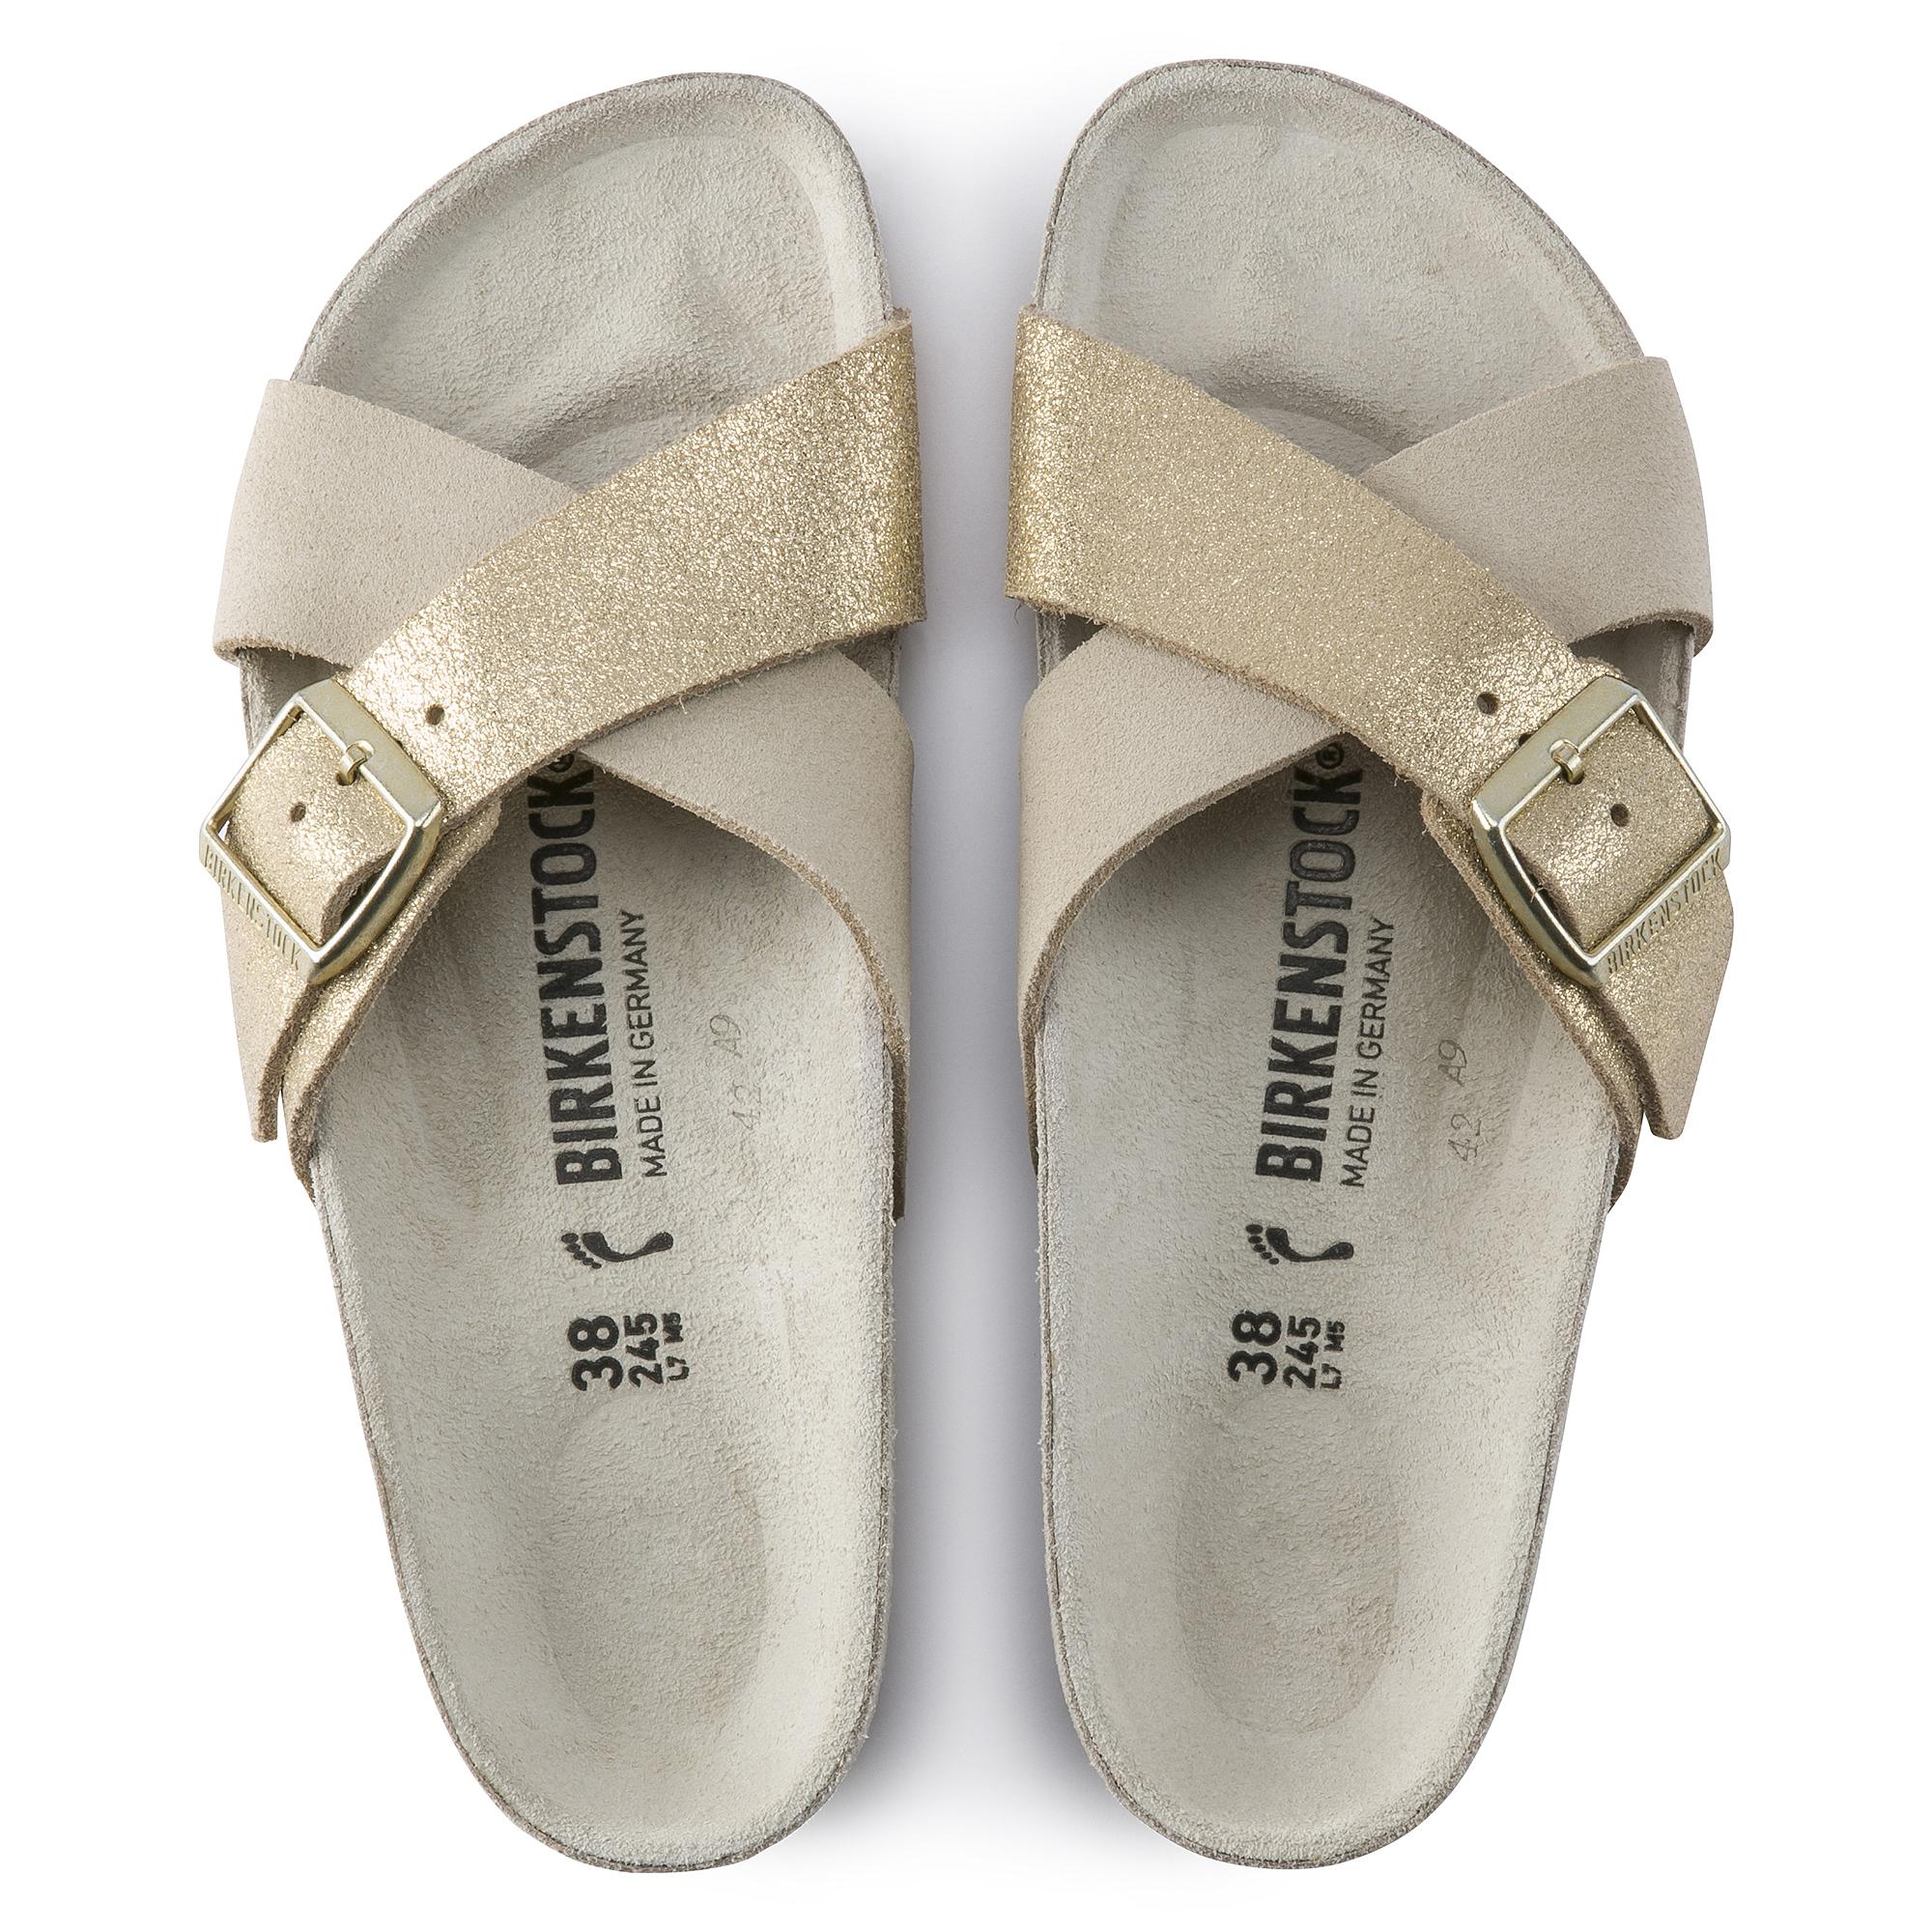 The Siena Exquisite an elegant new sandal from BIRKENSTOCK